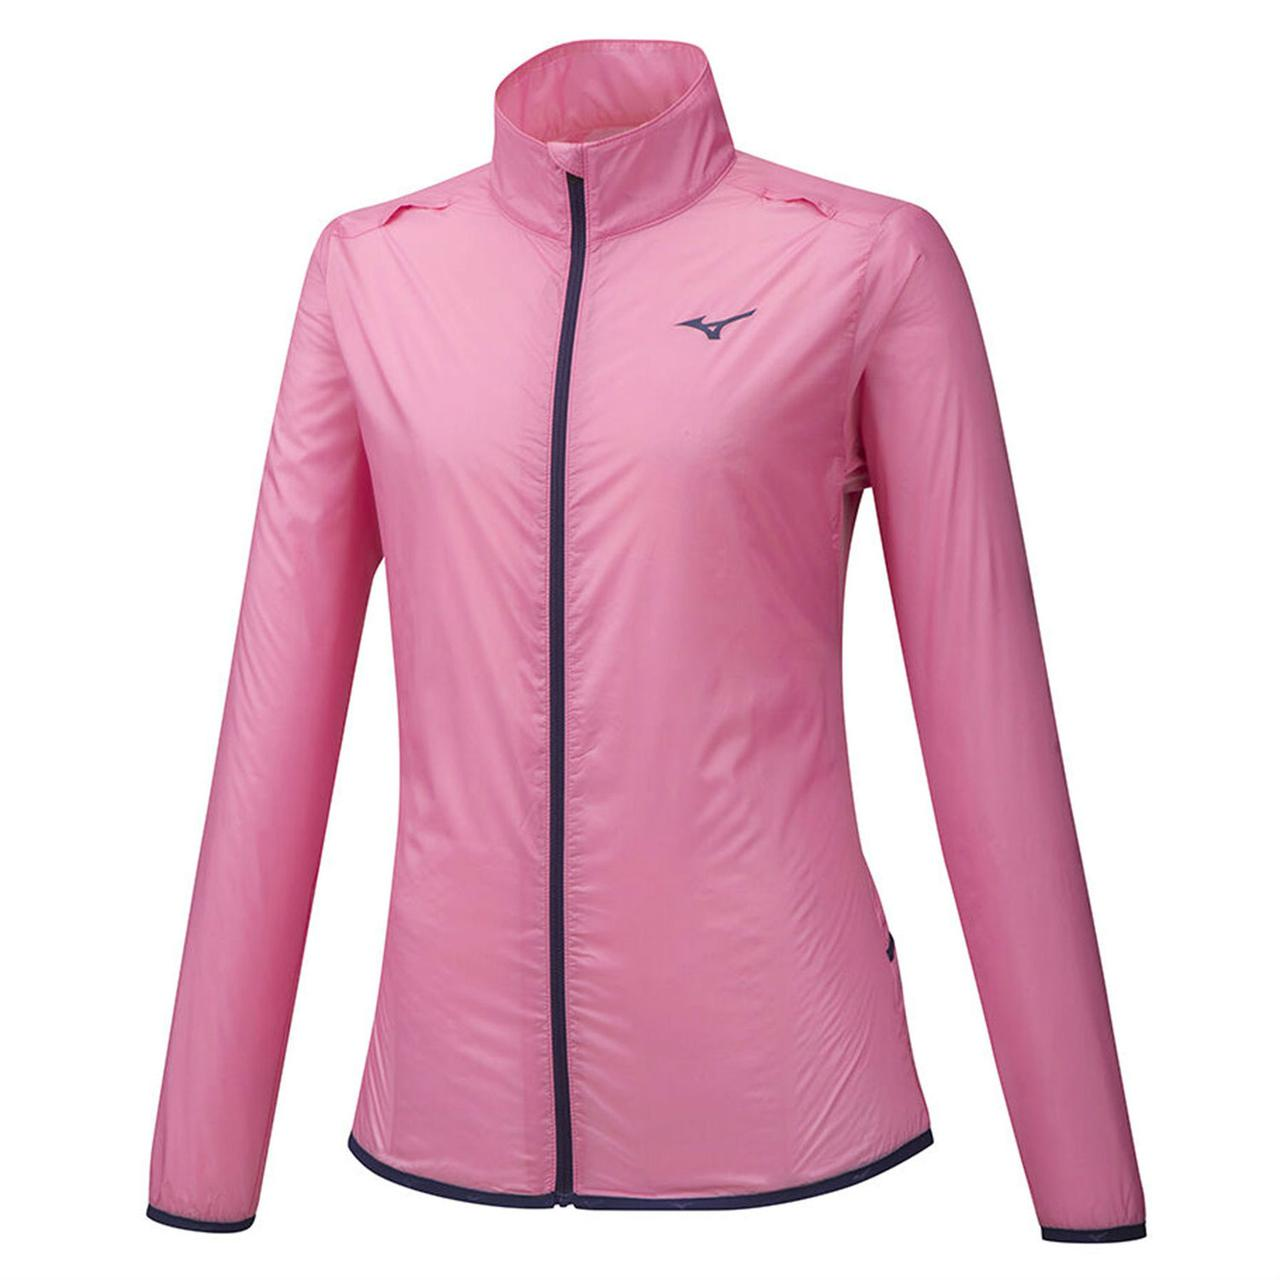 Куртка для бега Mizuno Hineri Pouch Jacket (Women) J2GE9720-64